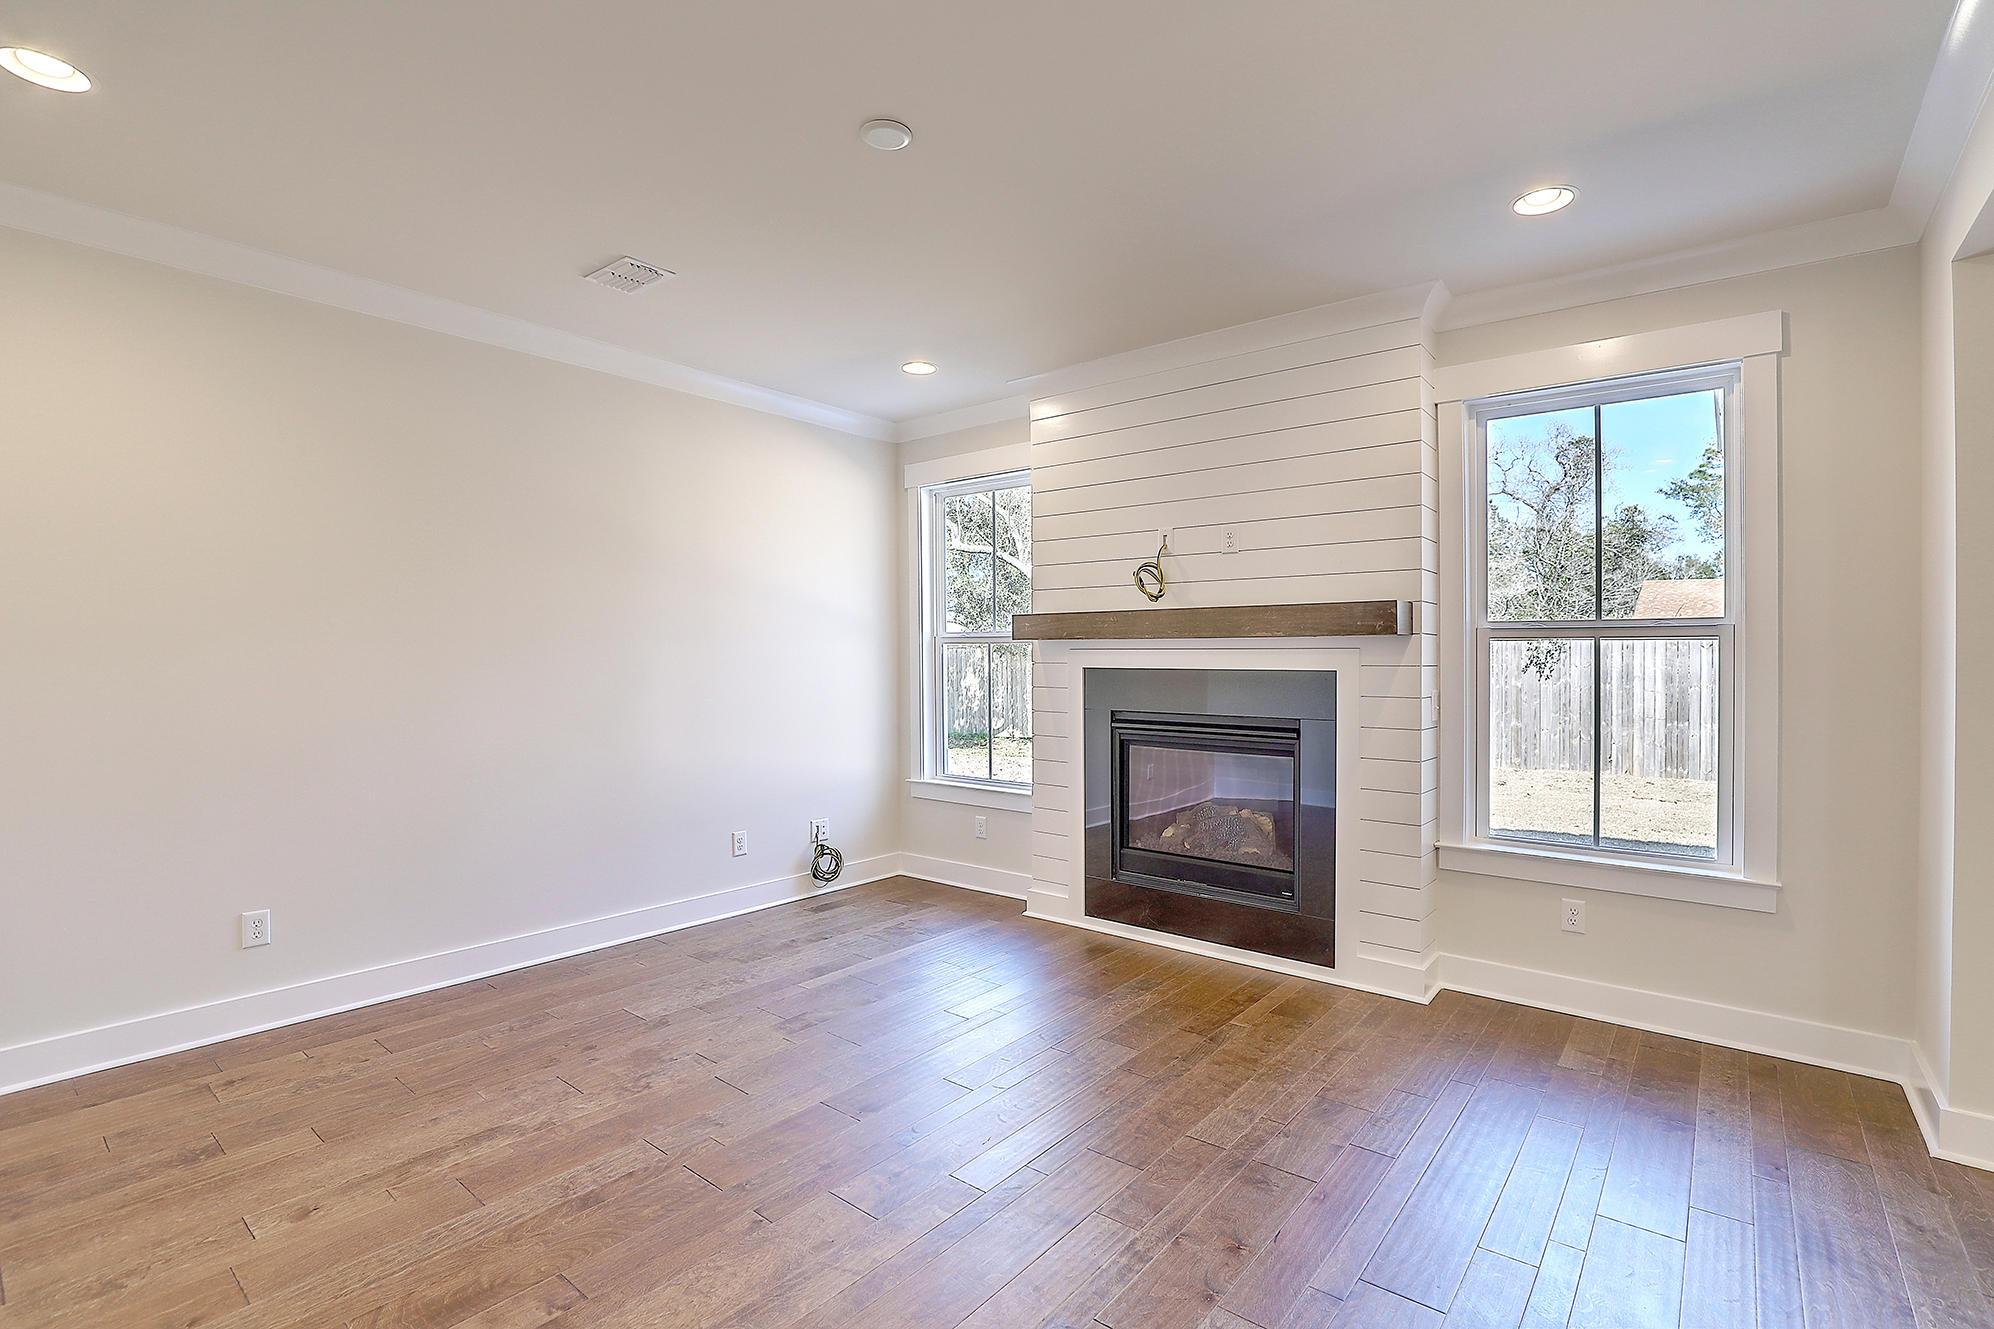 Bentley Park Homes For Sale - 1218 Gannett, Mount Pleasant, SC - 22